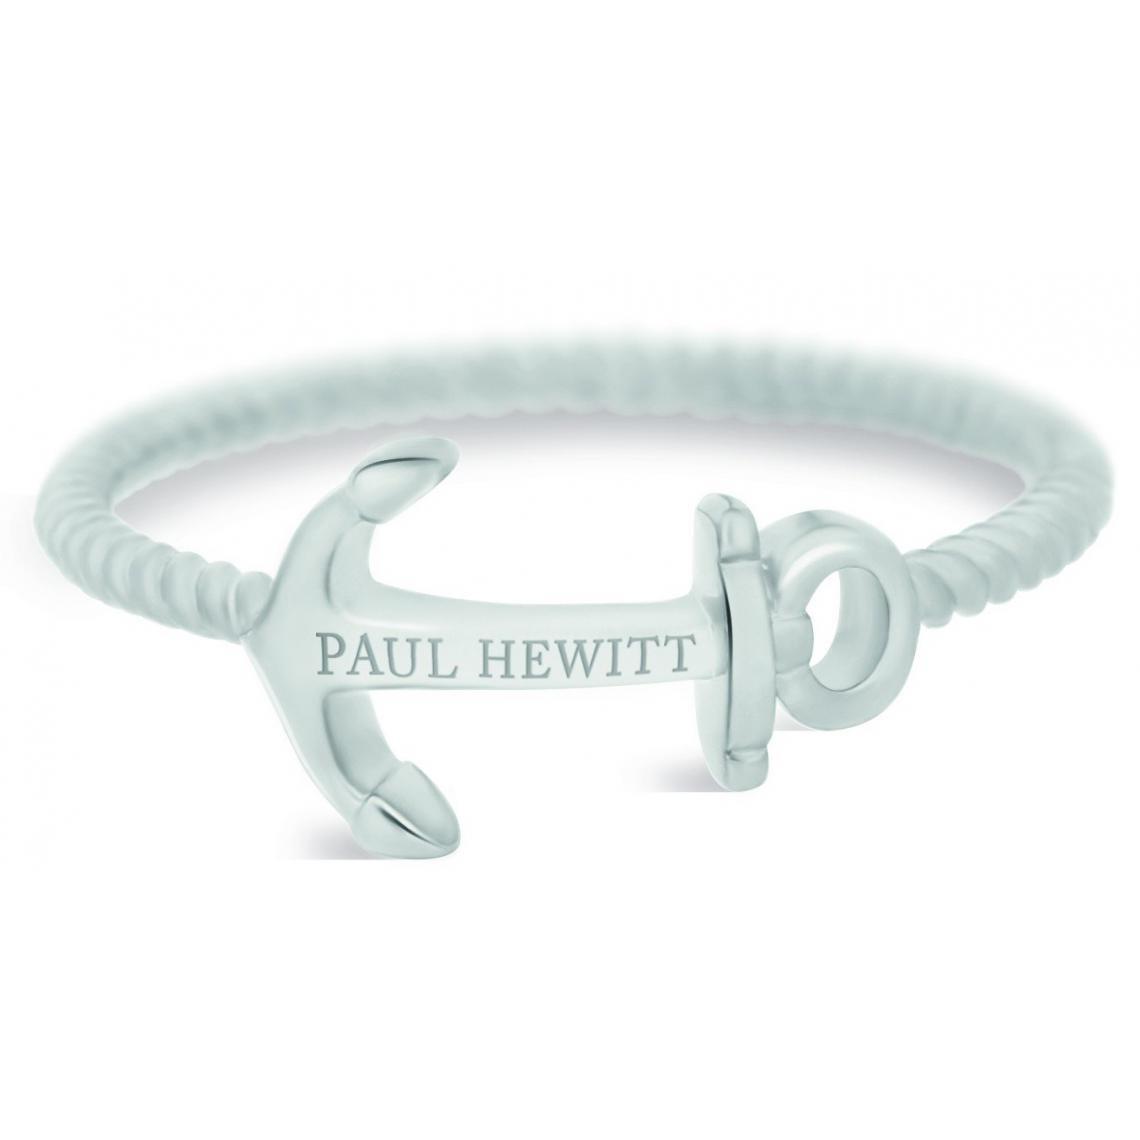 Bague Paul Hewitt PH-FR-ARO-S - Bague Anchor Rope Acier - Paul Hewitt Bijoux - Modalova